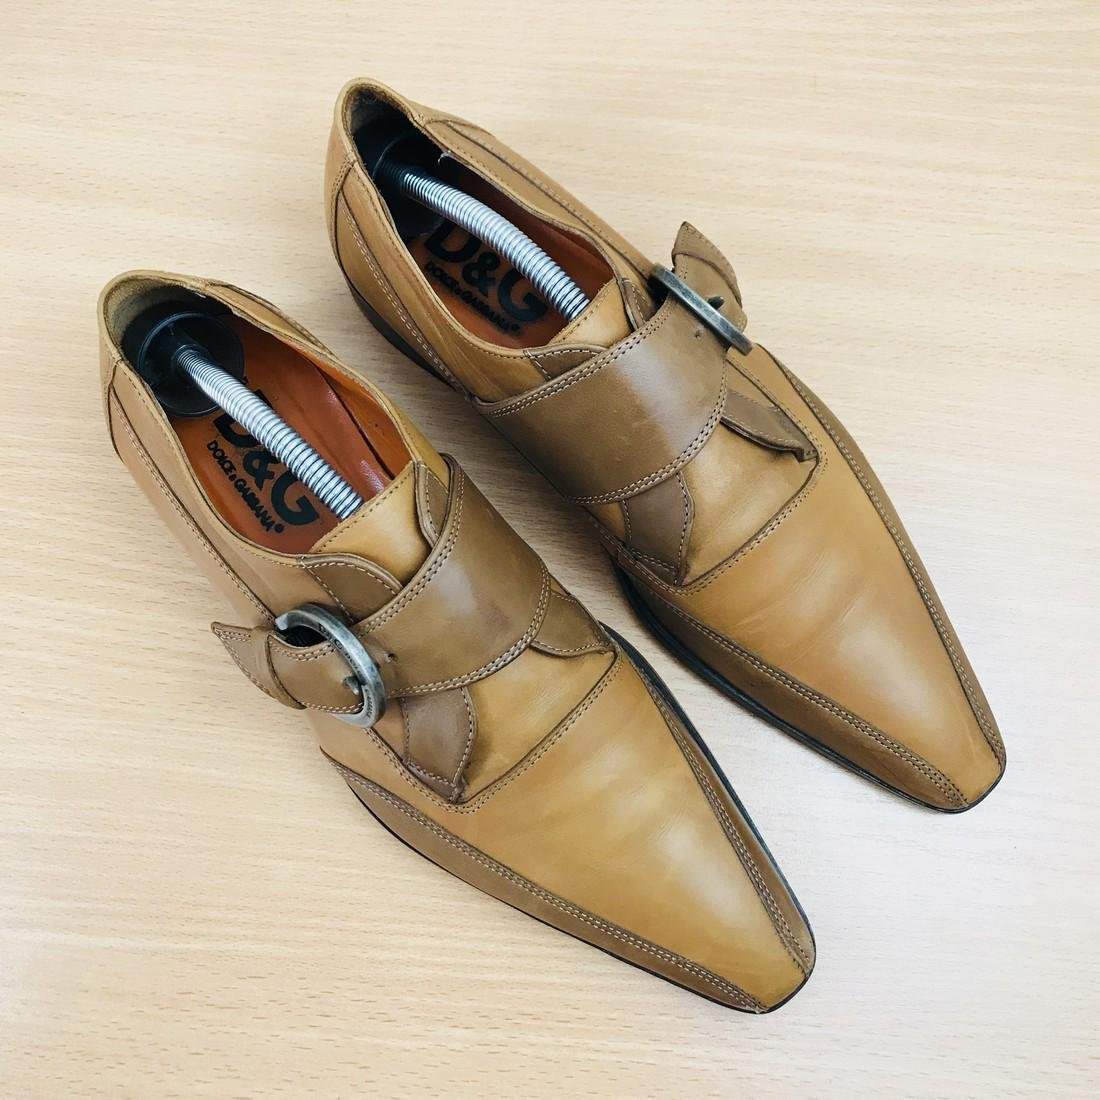 Dolce & Gabbana – Leather Shoes Size EUR 42 UK 8.5 US 9 - 4